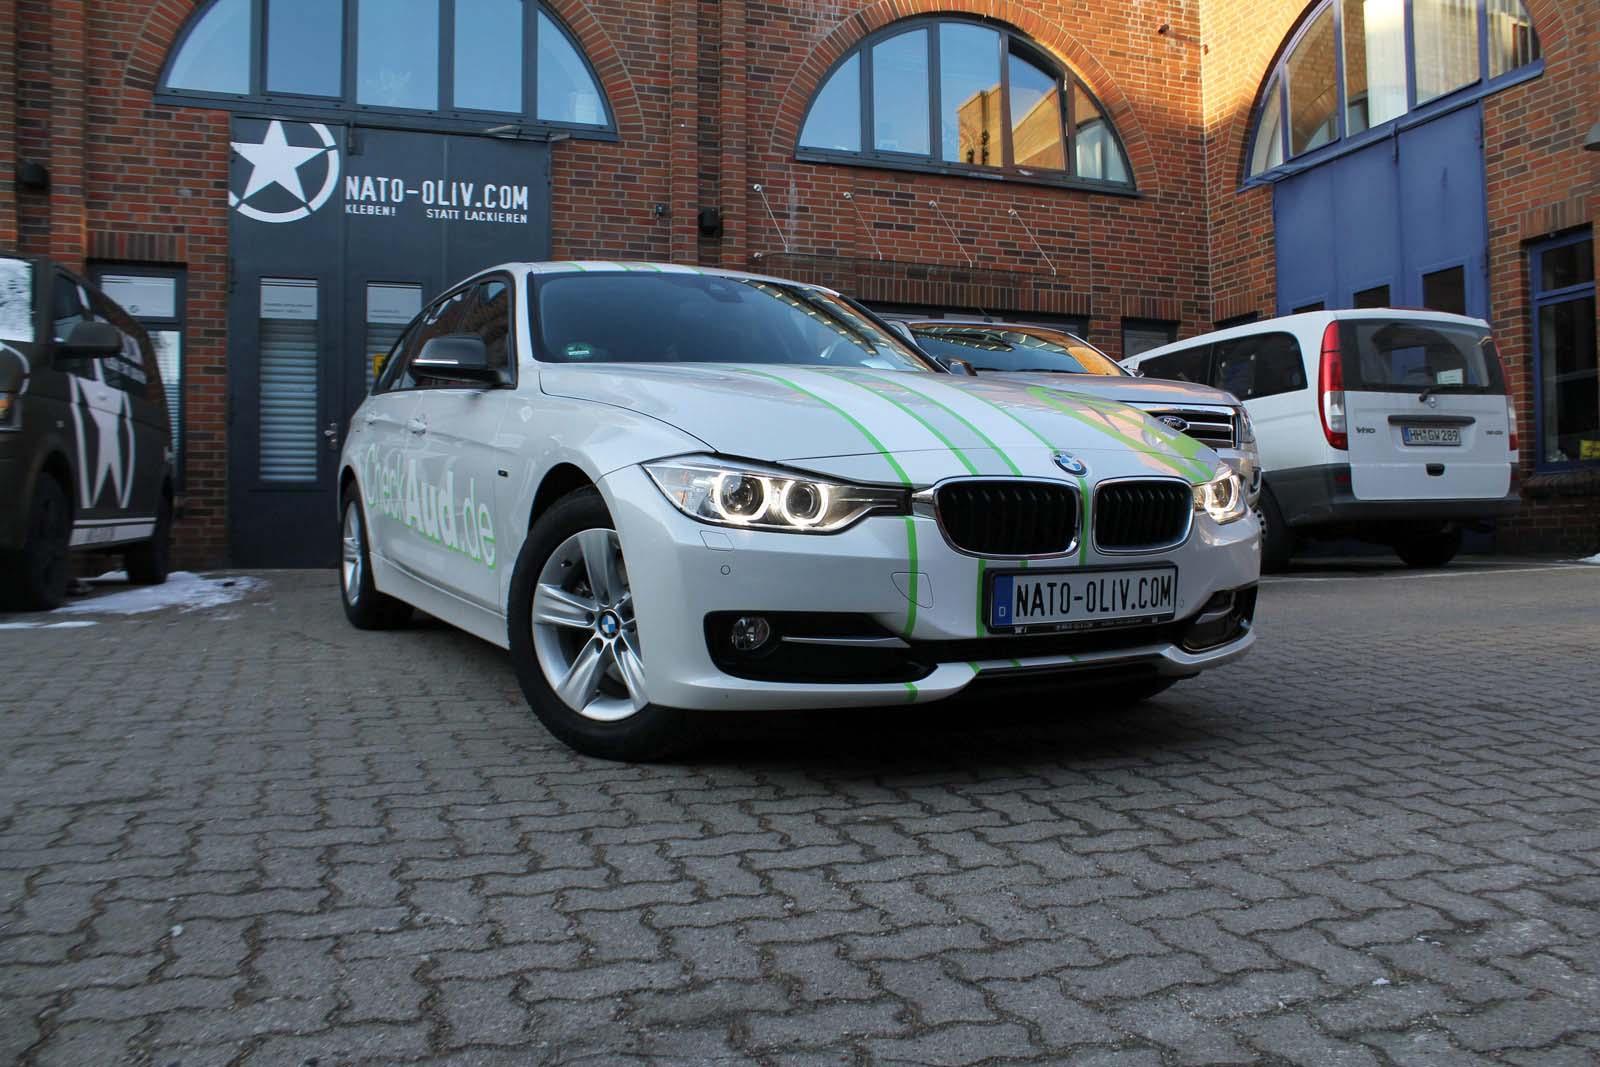 BMW_3ER_RALLYESTREIFEN_WEISS_GRUEN_MATT_MIT_BRANDING_20